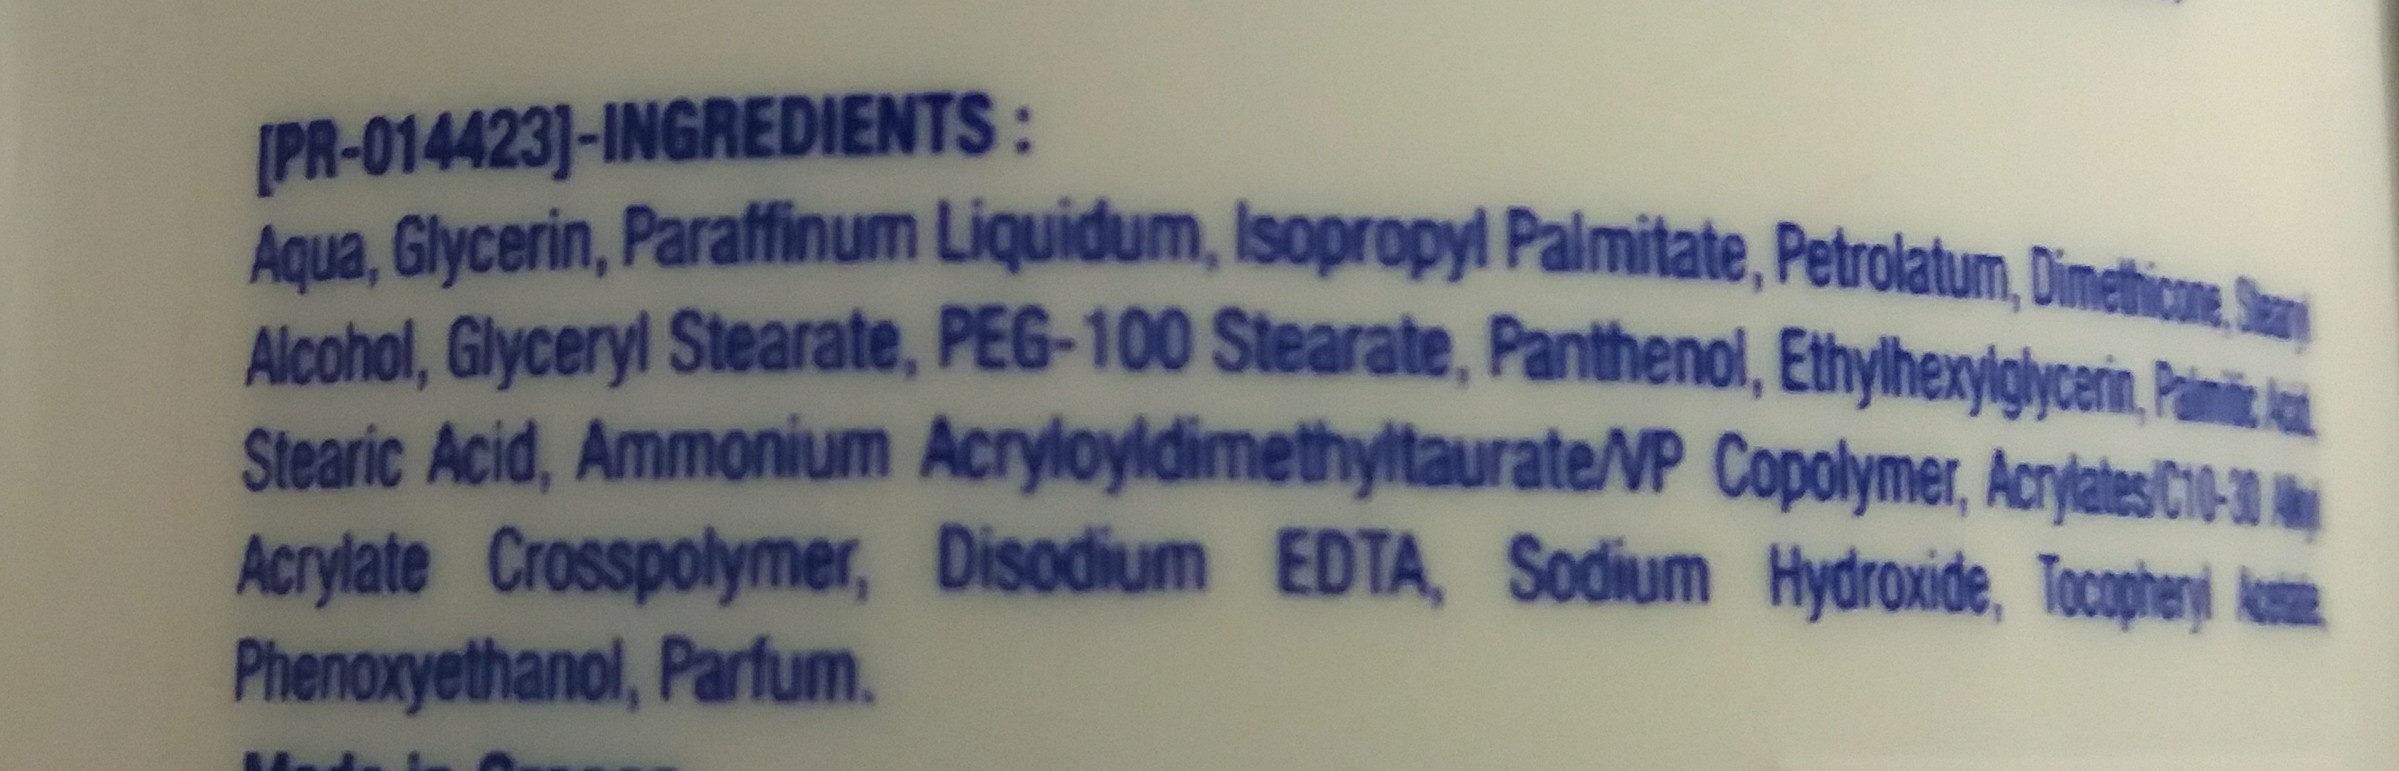 Sofort einziehende Handcreme - Ingredients - de